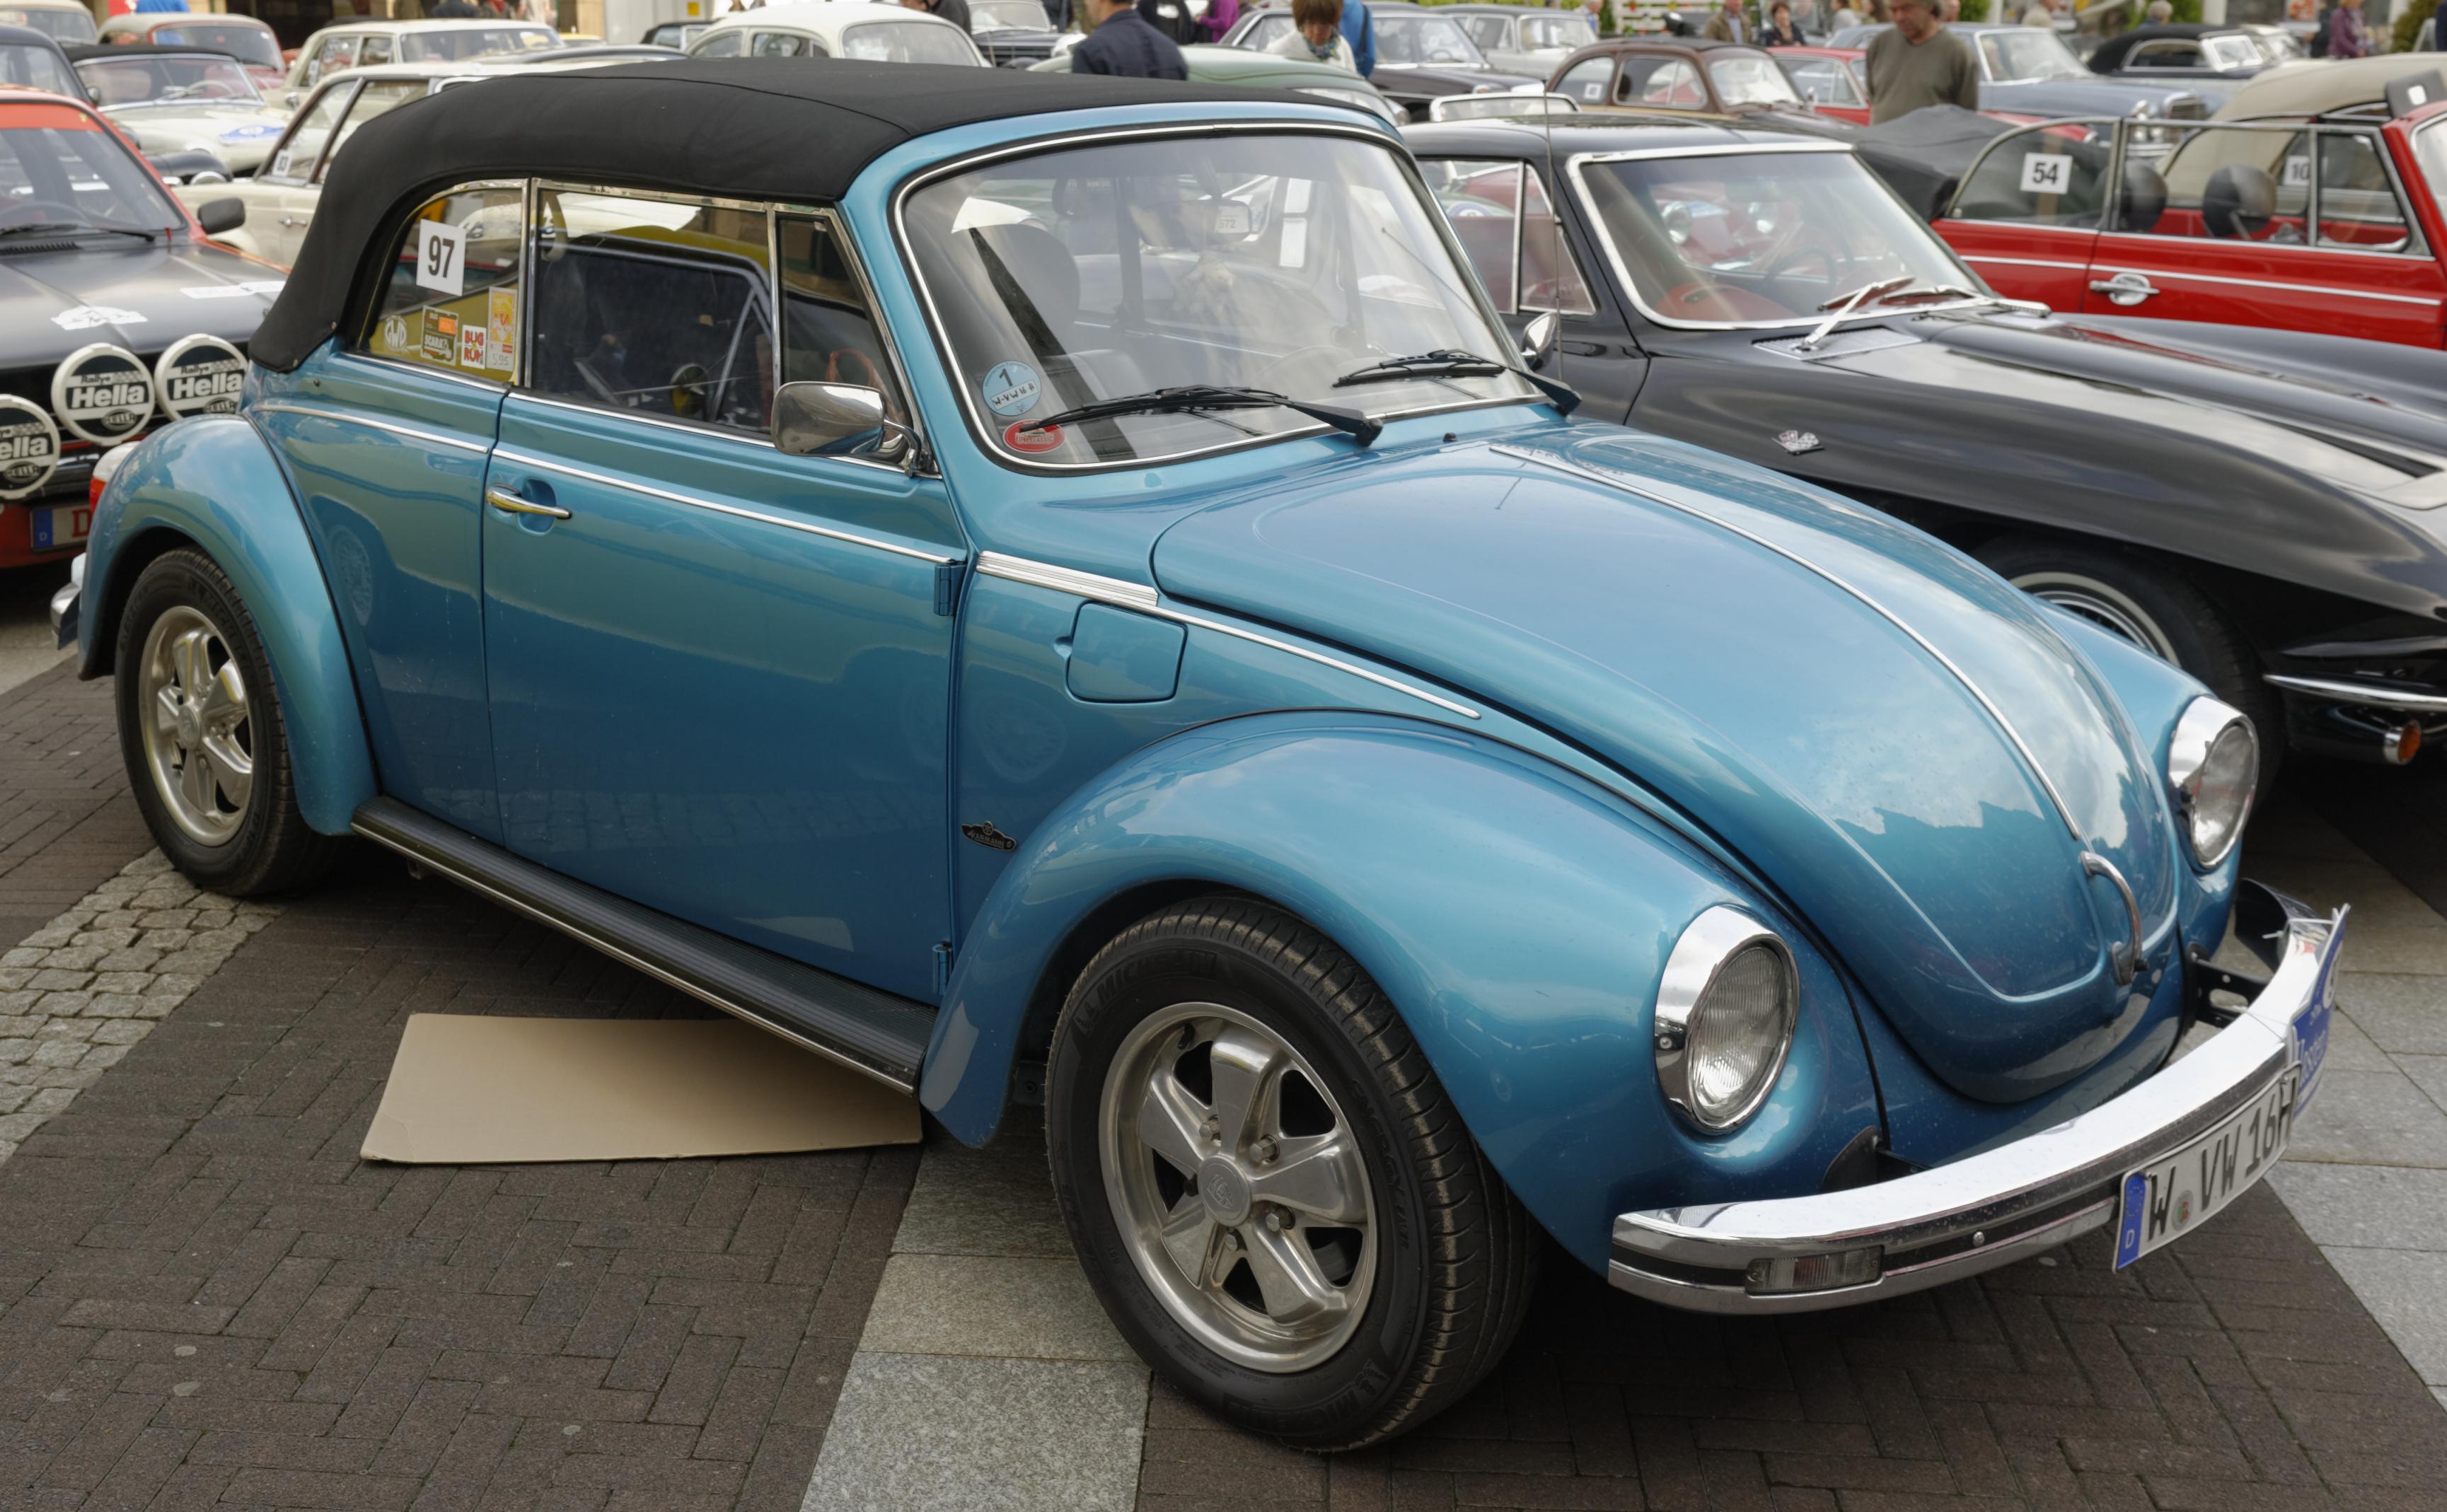 File:VW Käfer 1303 LS 2 m.jpg